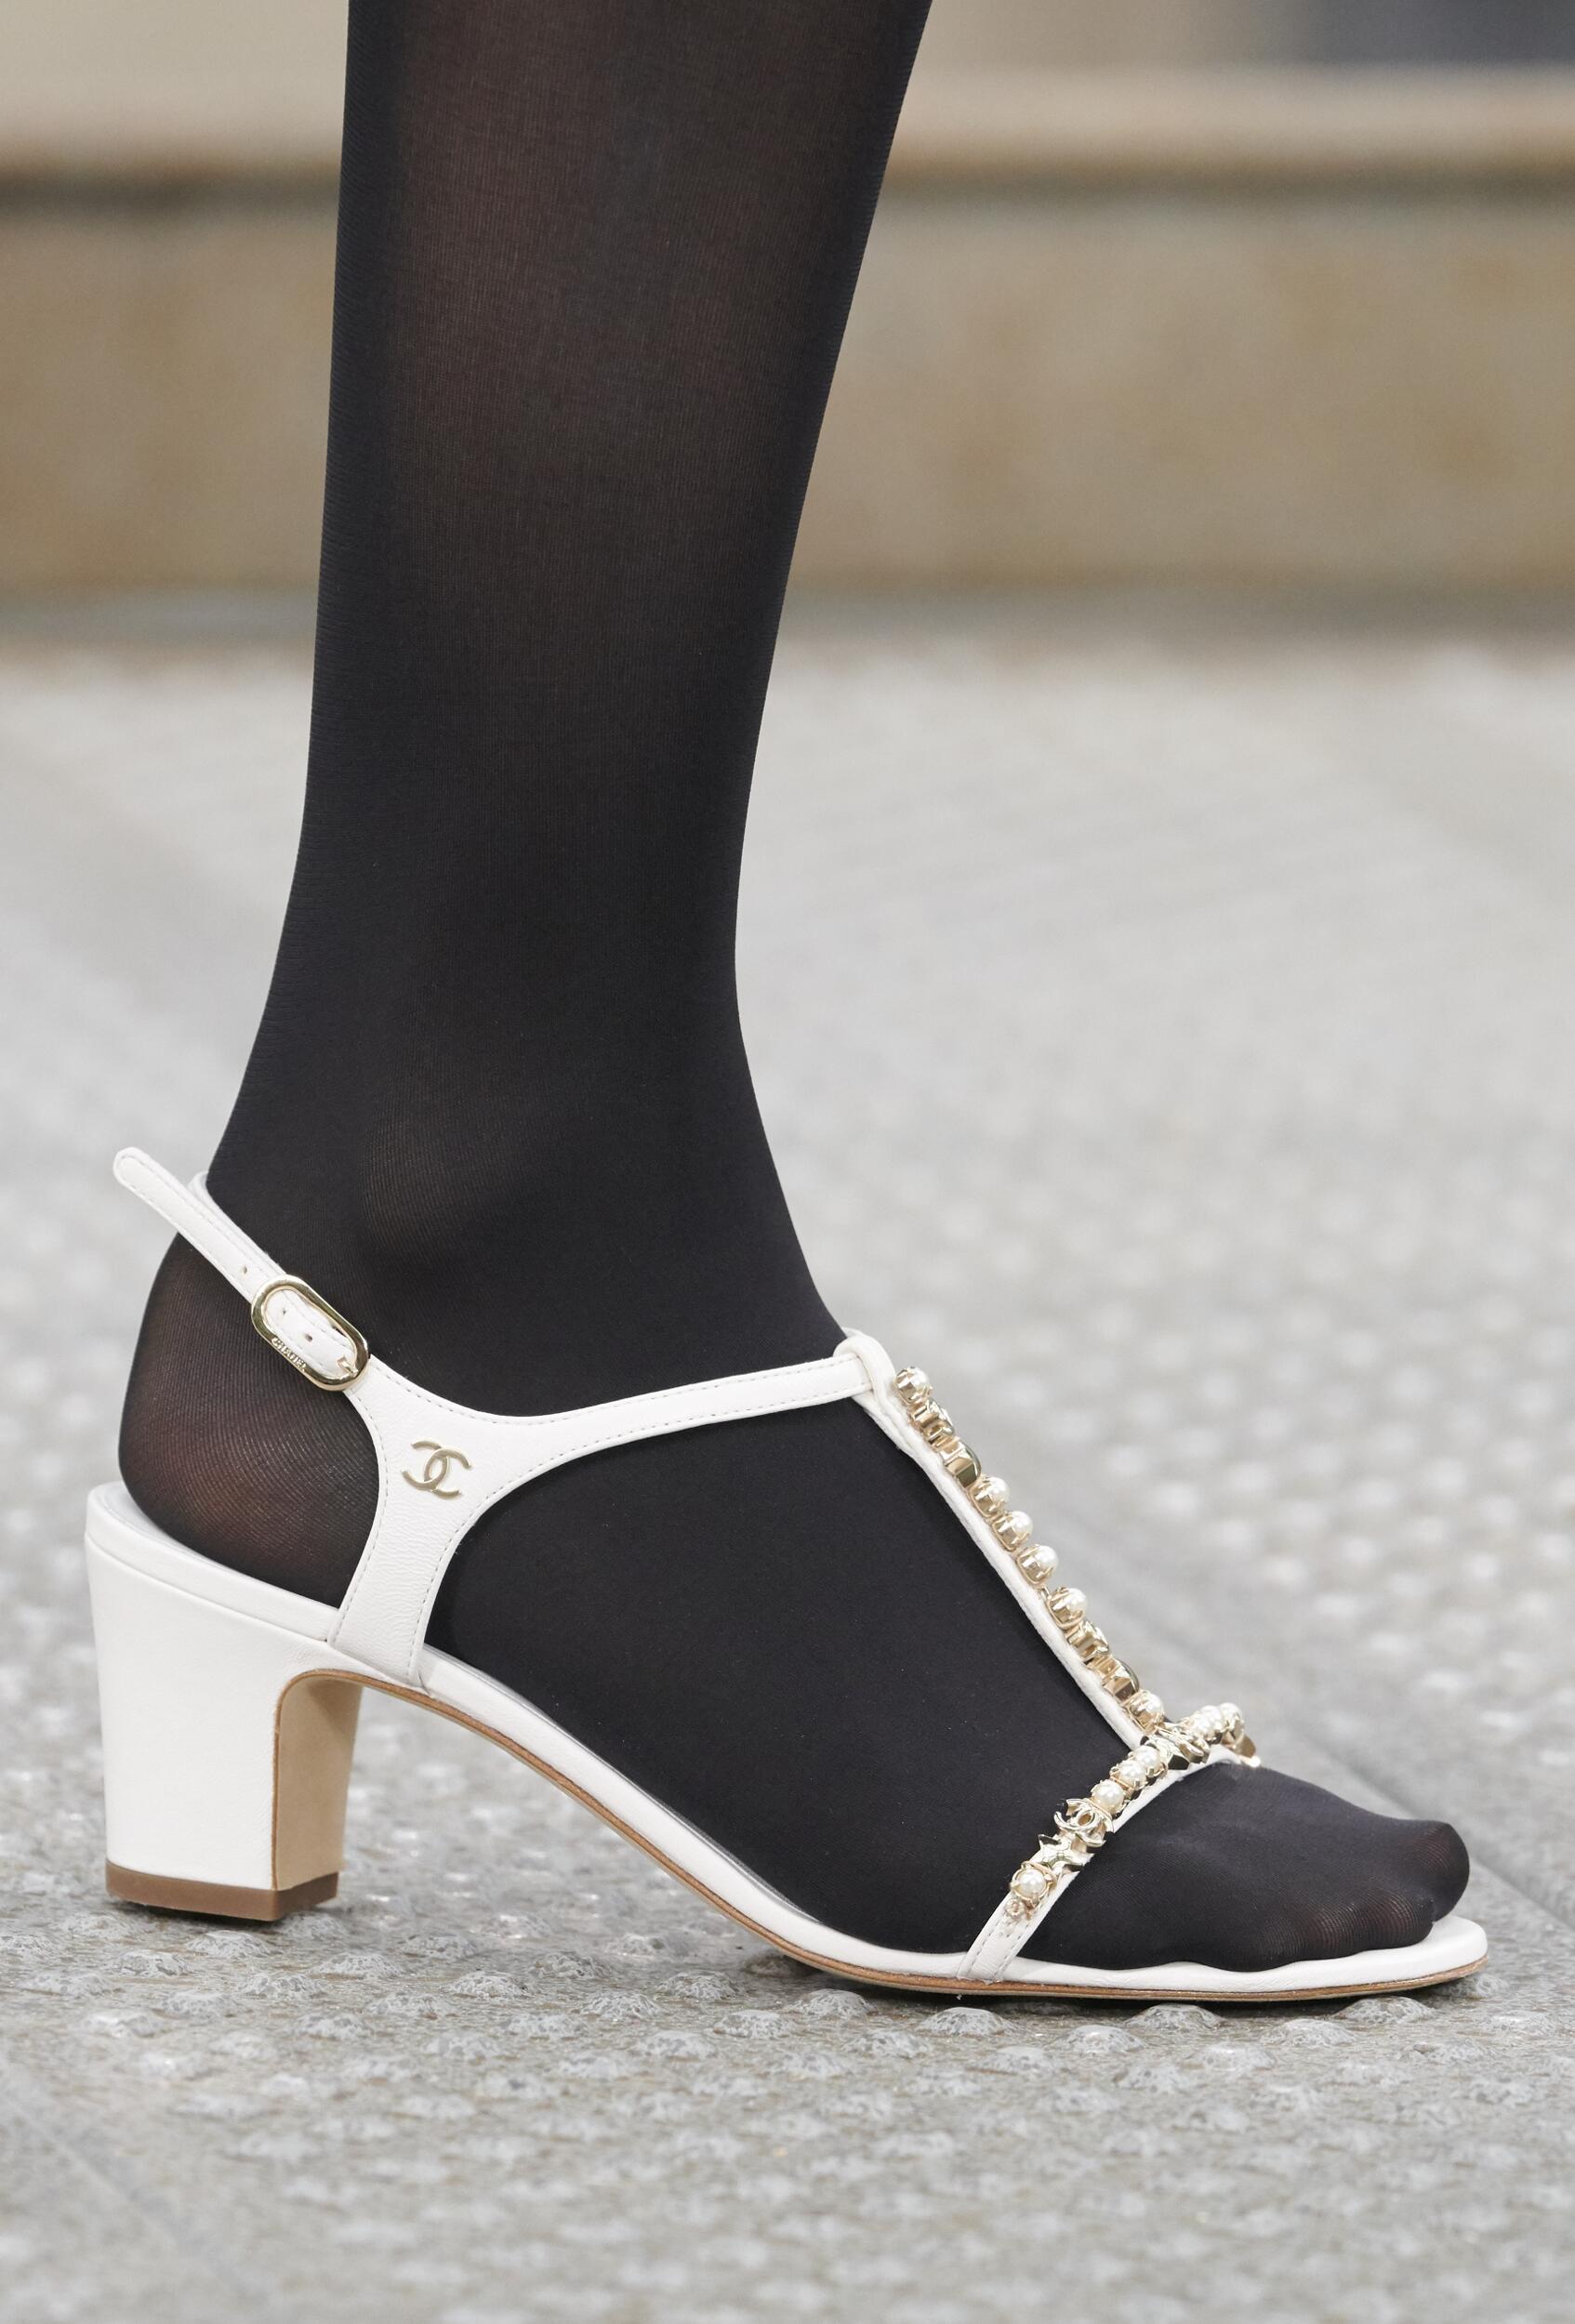 Shoe Detail Chanel Woman Fashion Show Summer 2020